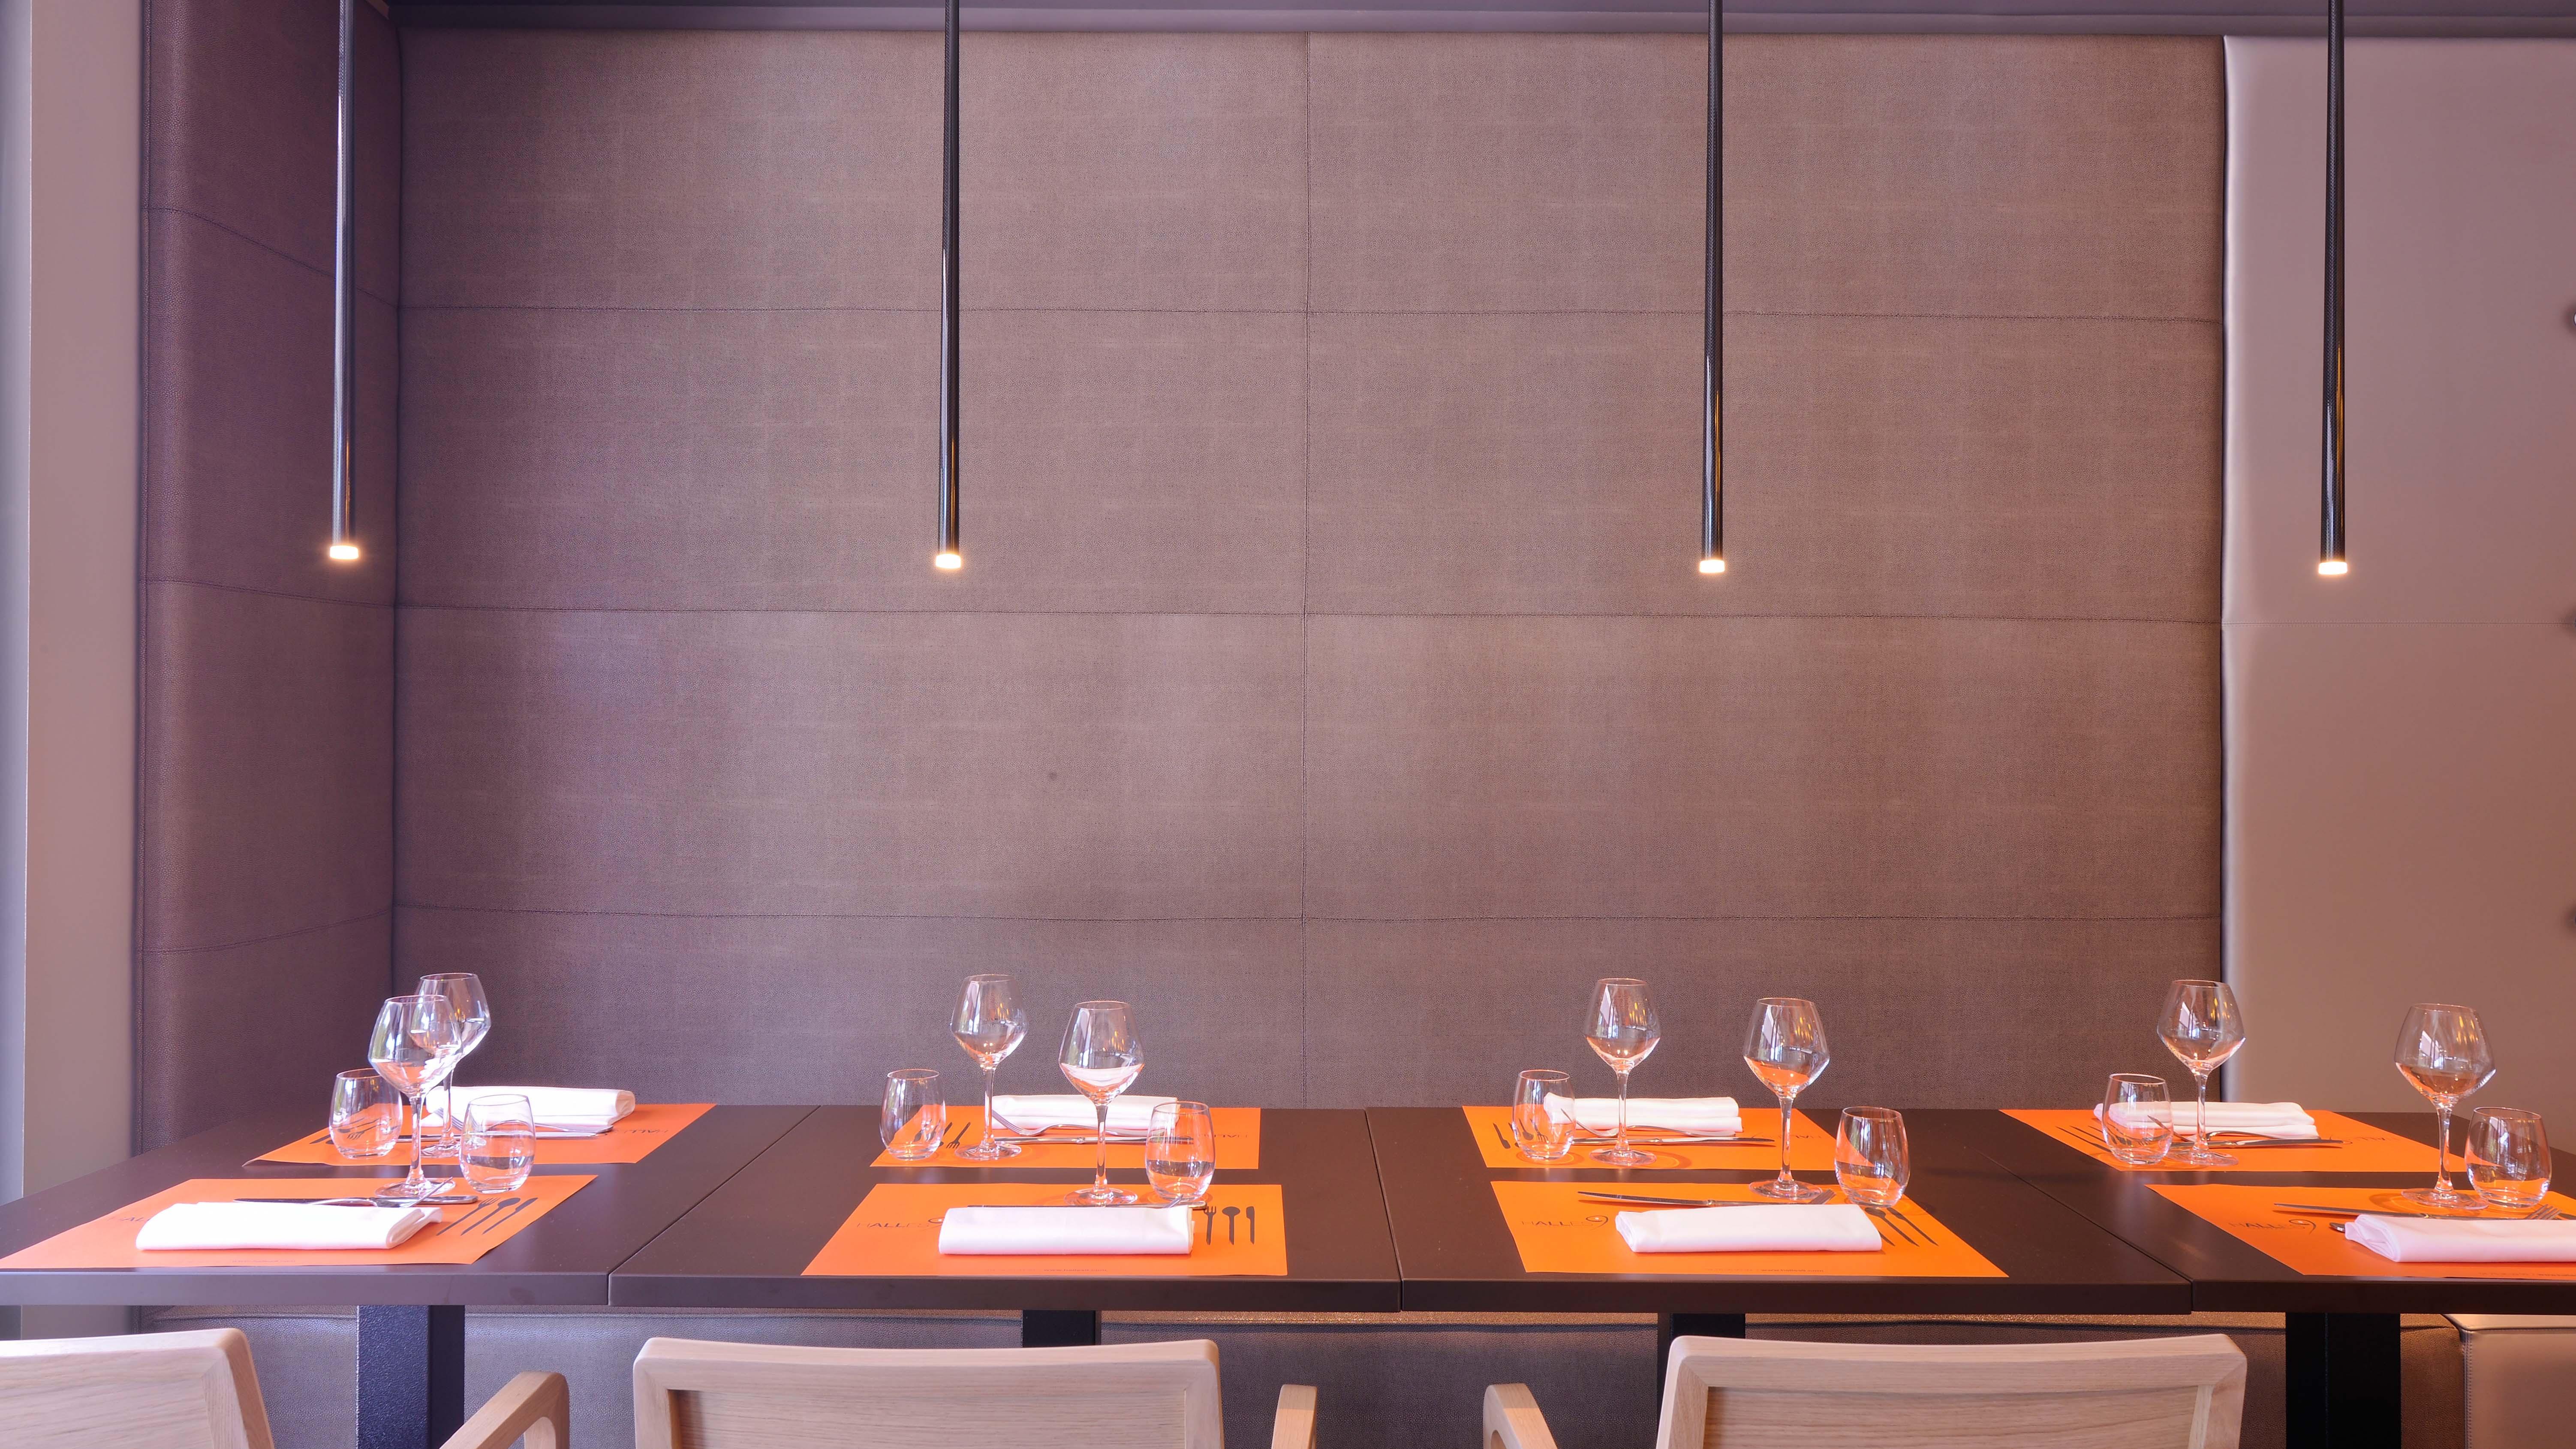 Halles 9 In Tassin La Demi Lune Restaurant Reviews Menu And Prices Thefork